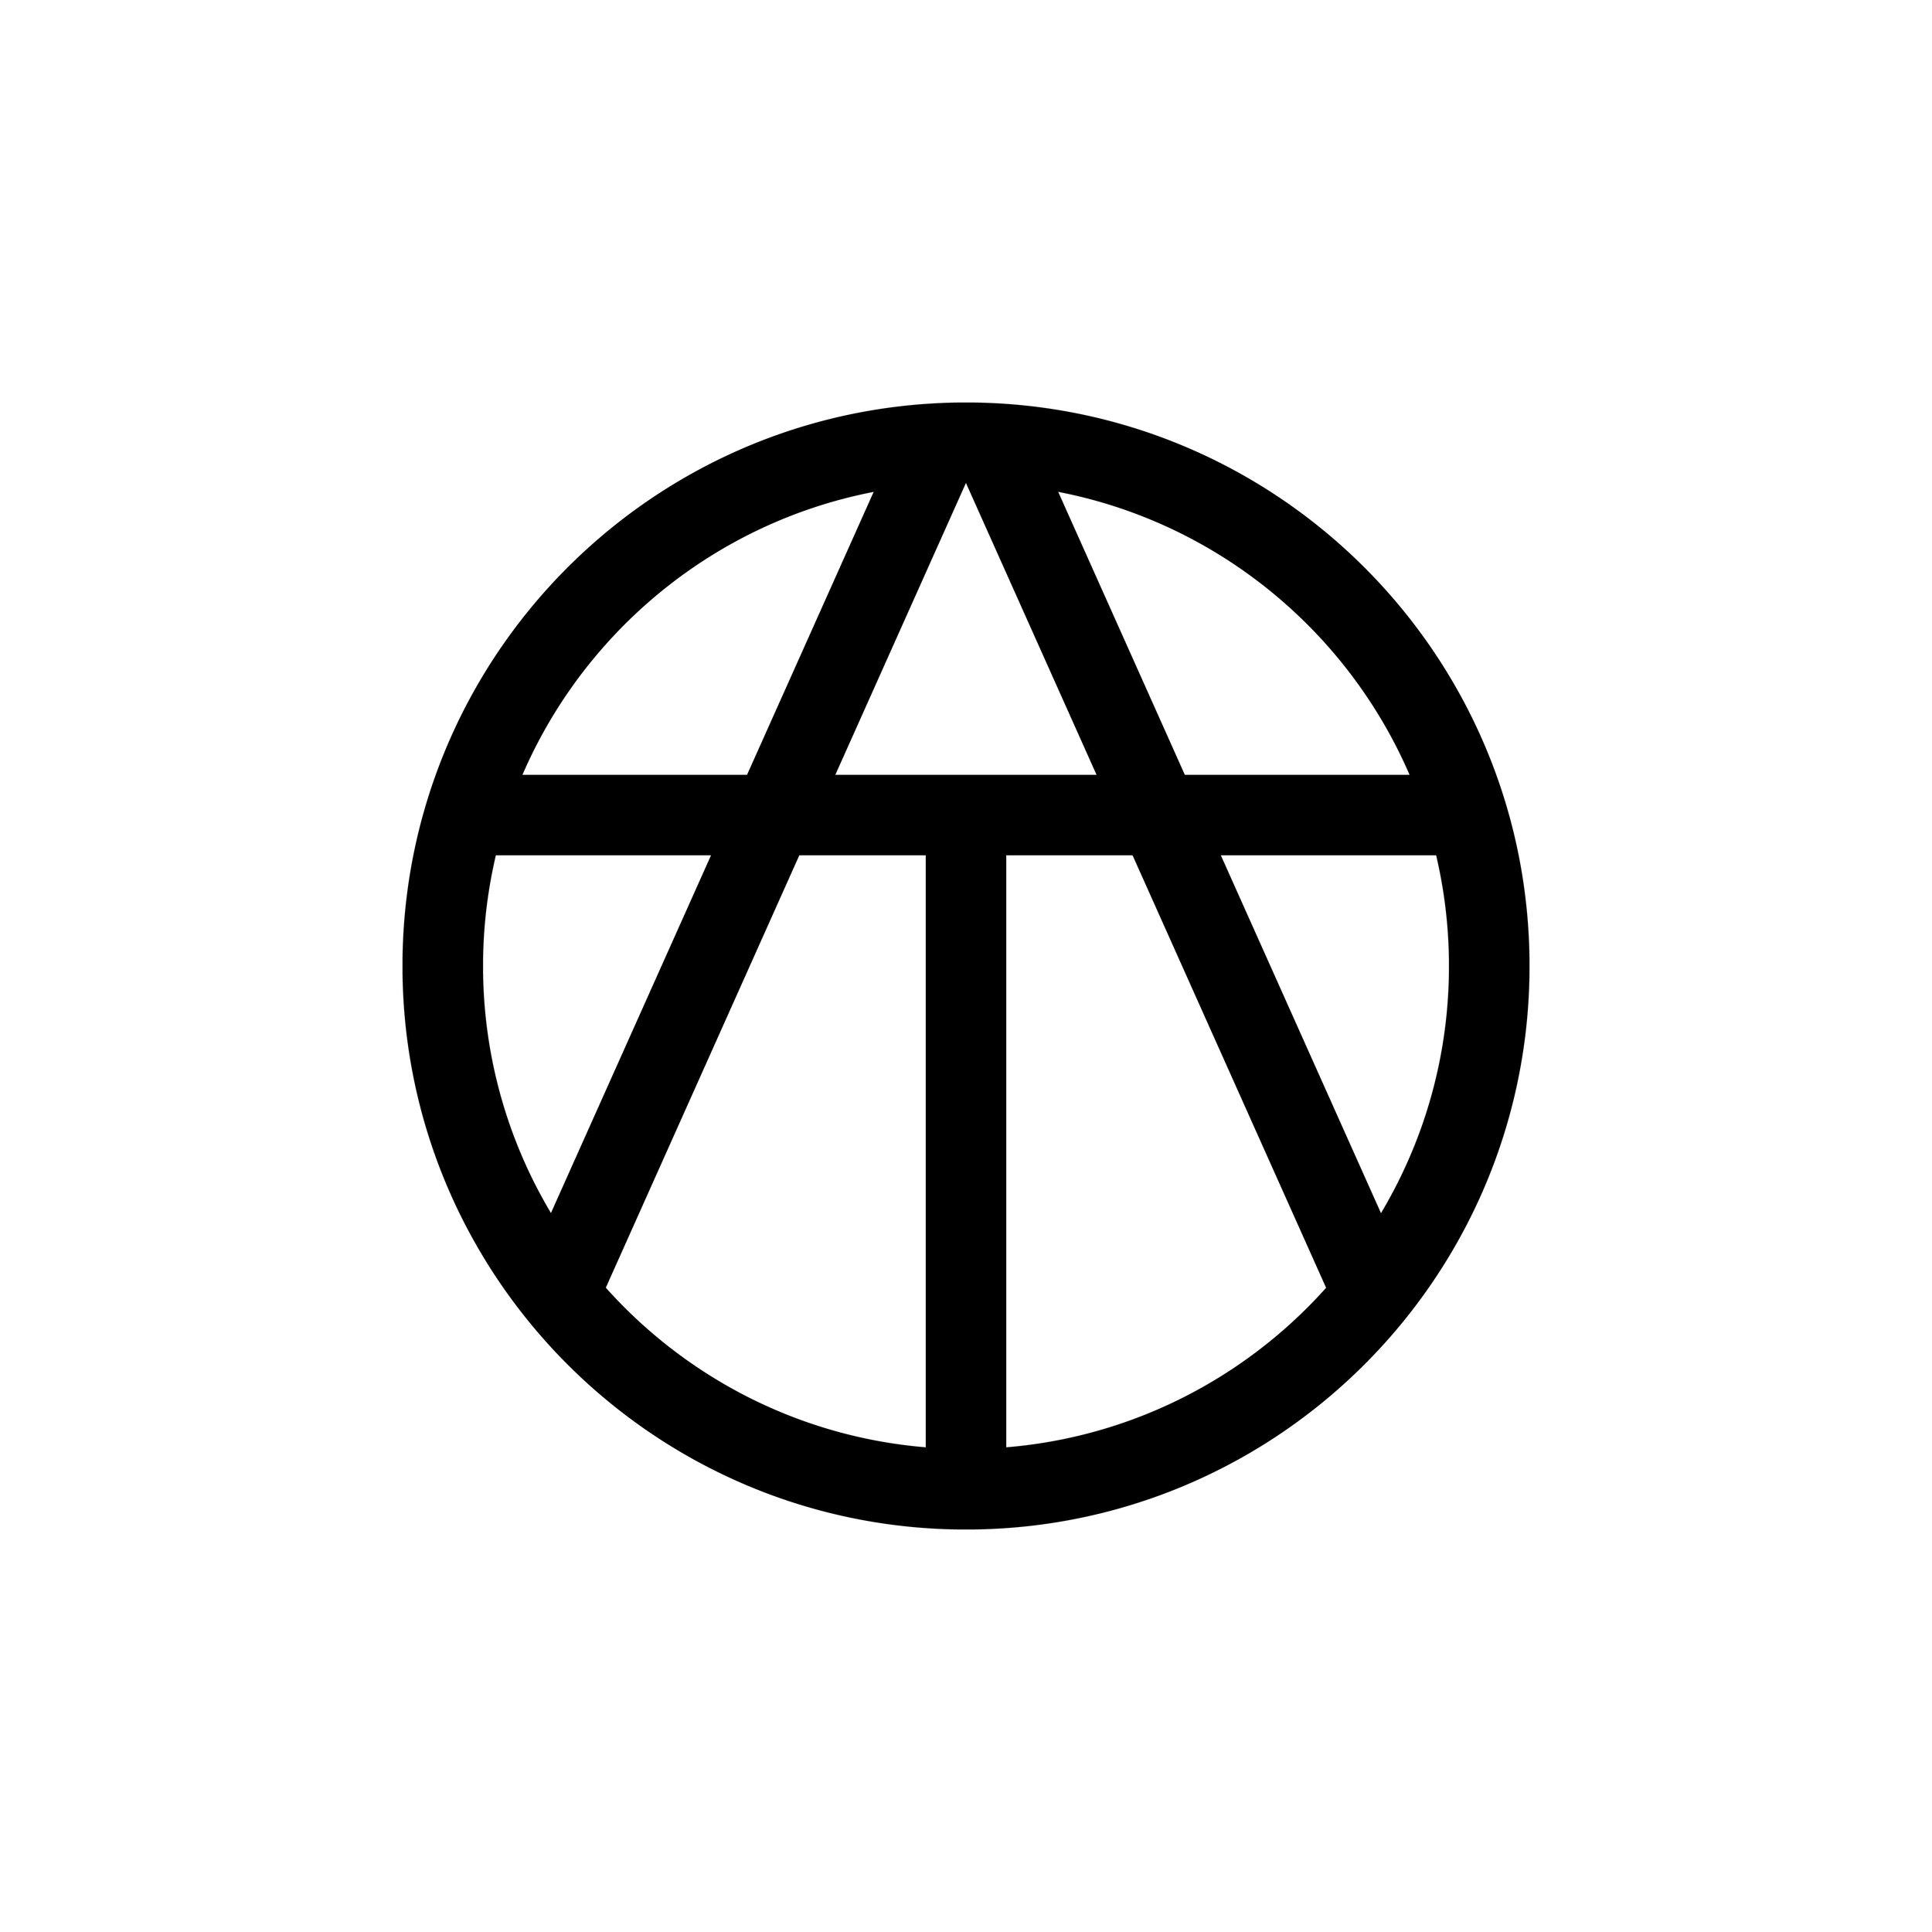 Personal Lettermark